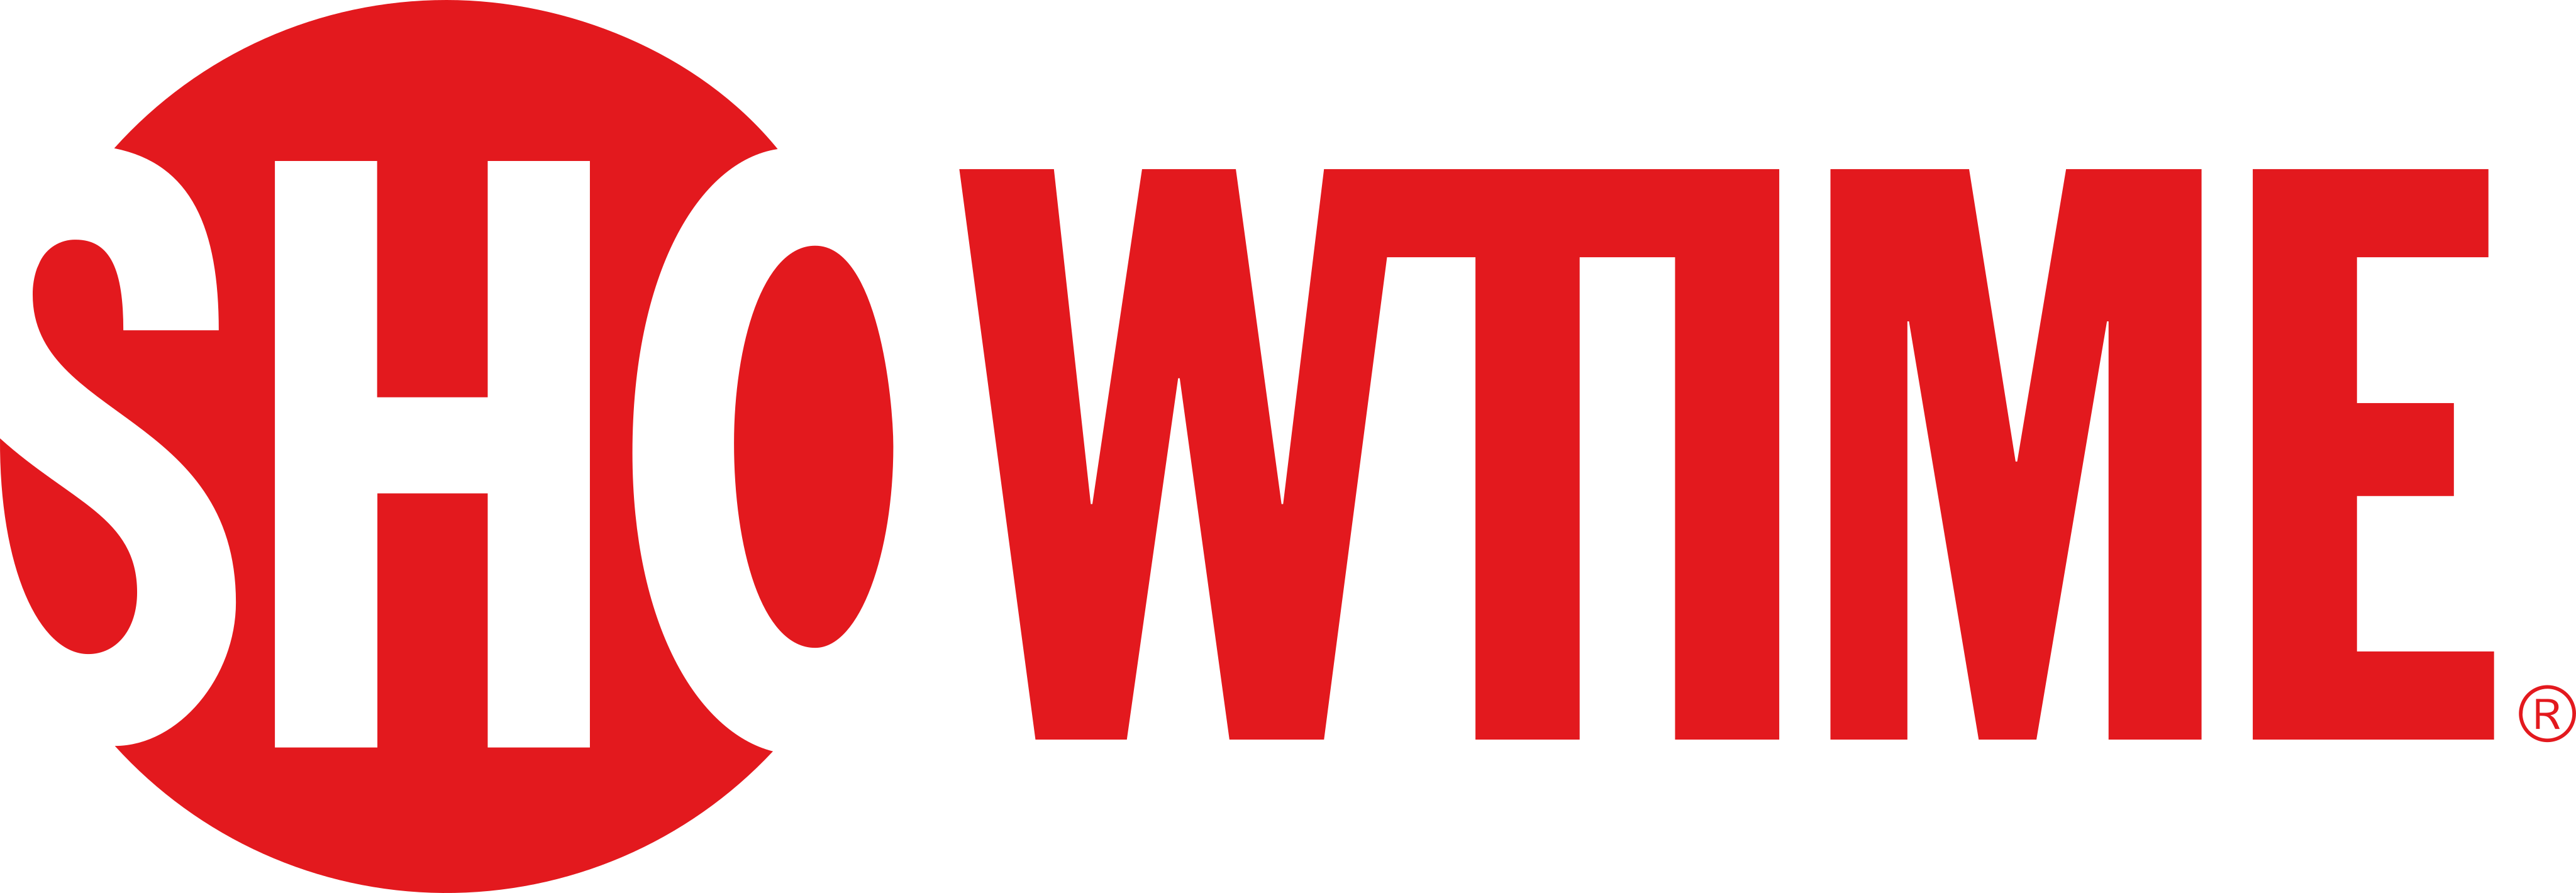 showtime logo 1 - SHOWTIME Logo